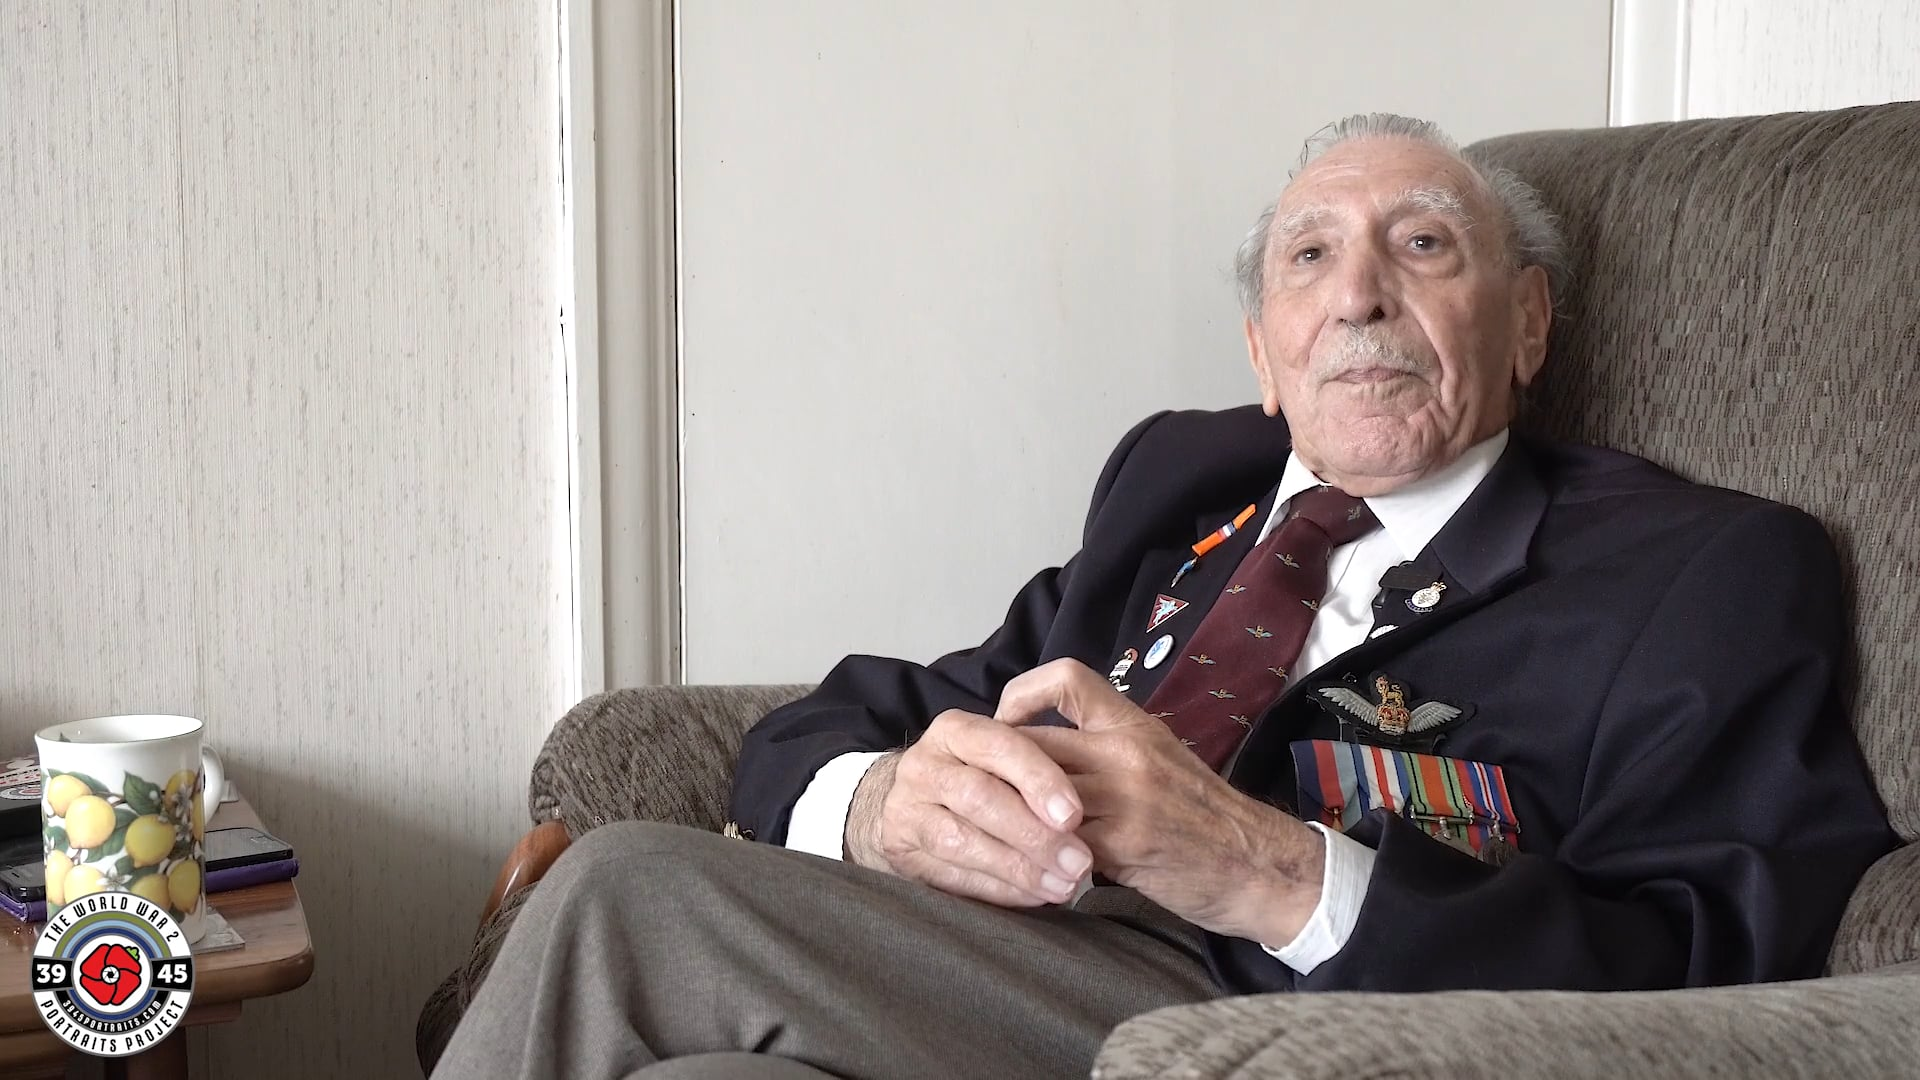 Frank Ashleigh: There were Germans everywhere